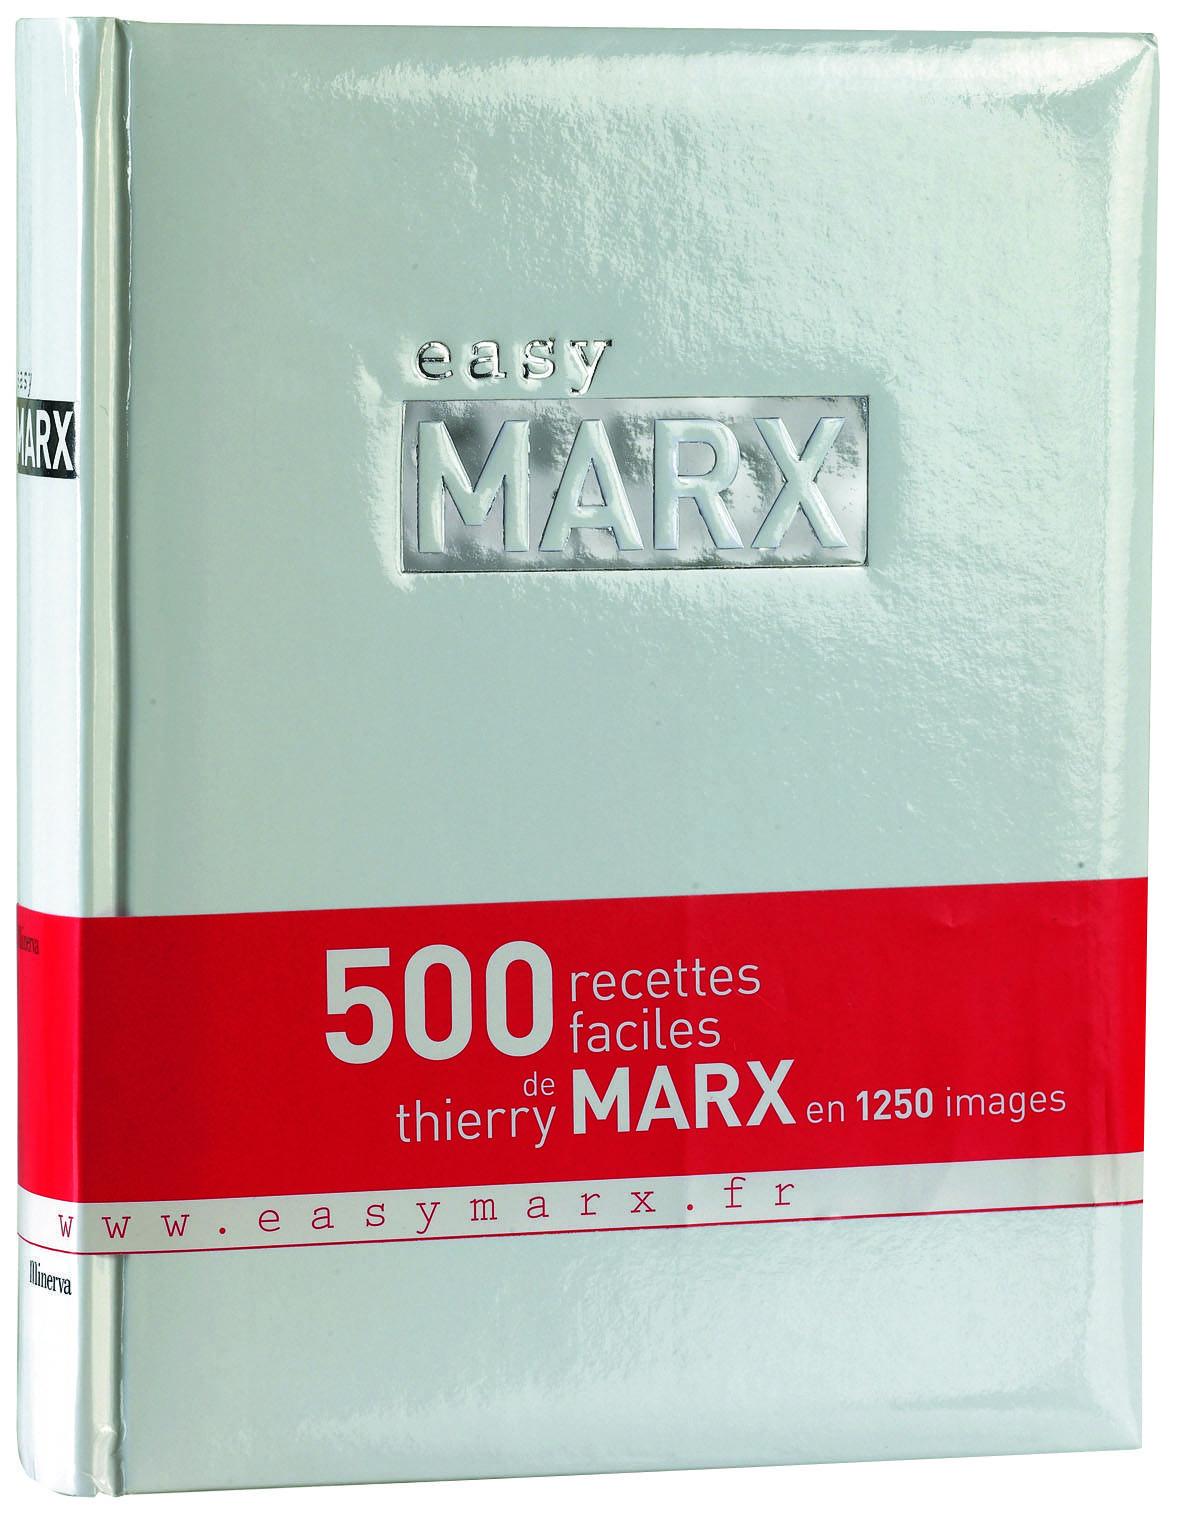 Eeasy Marx